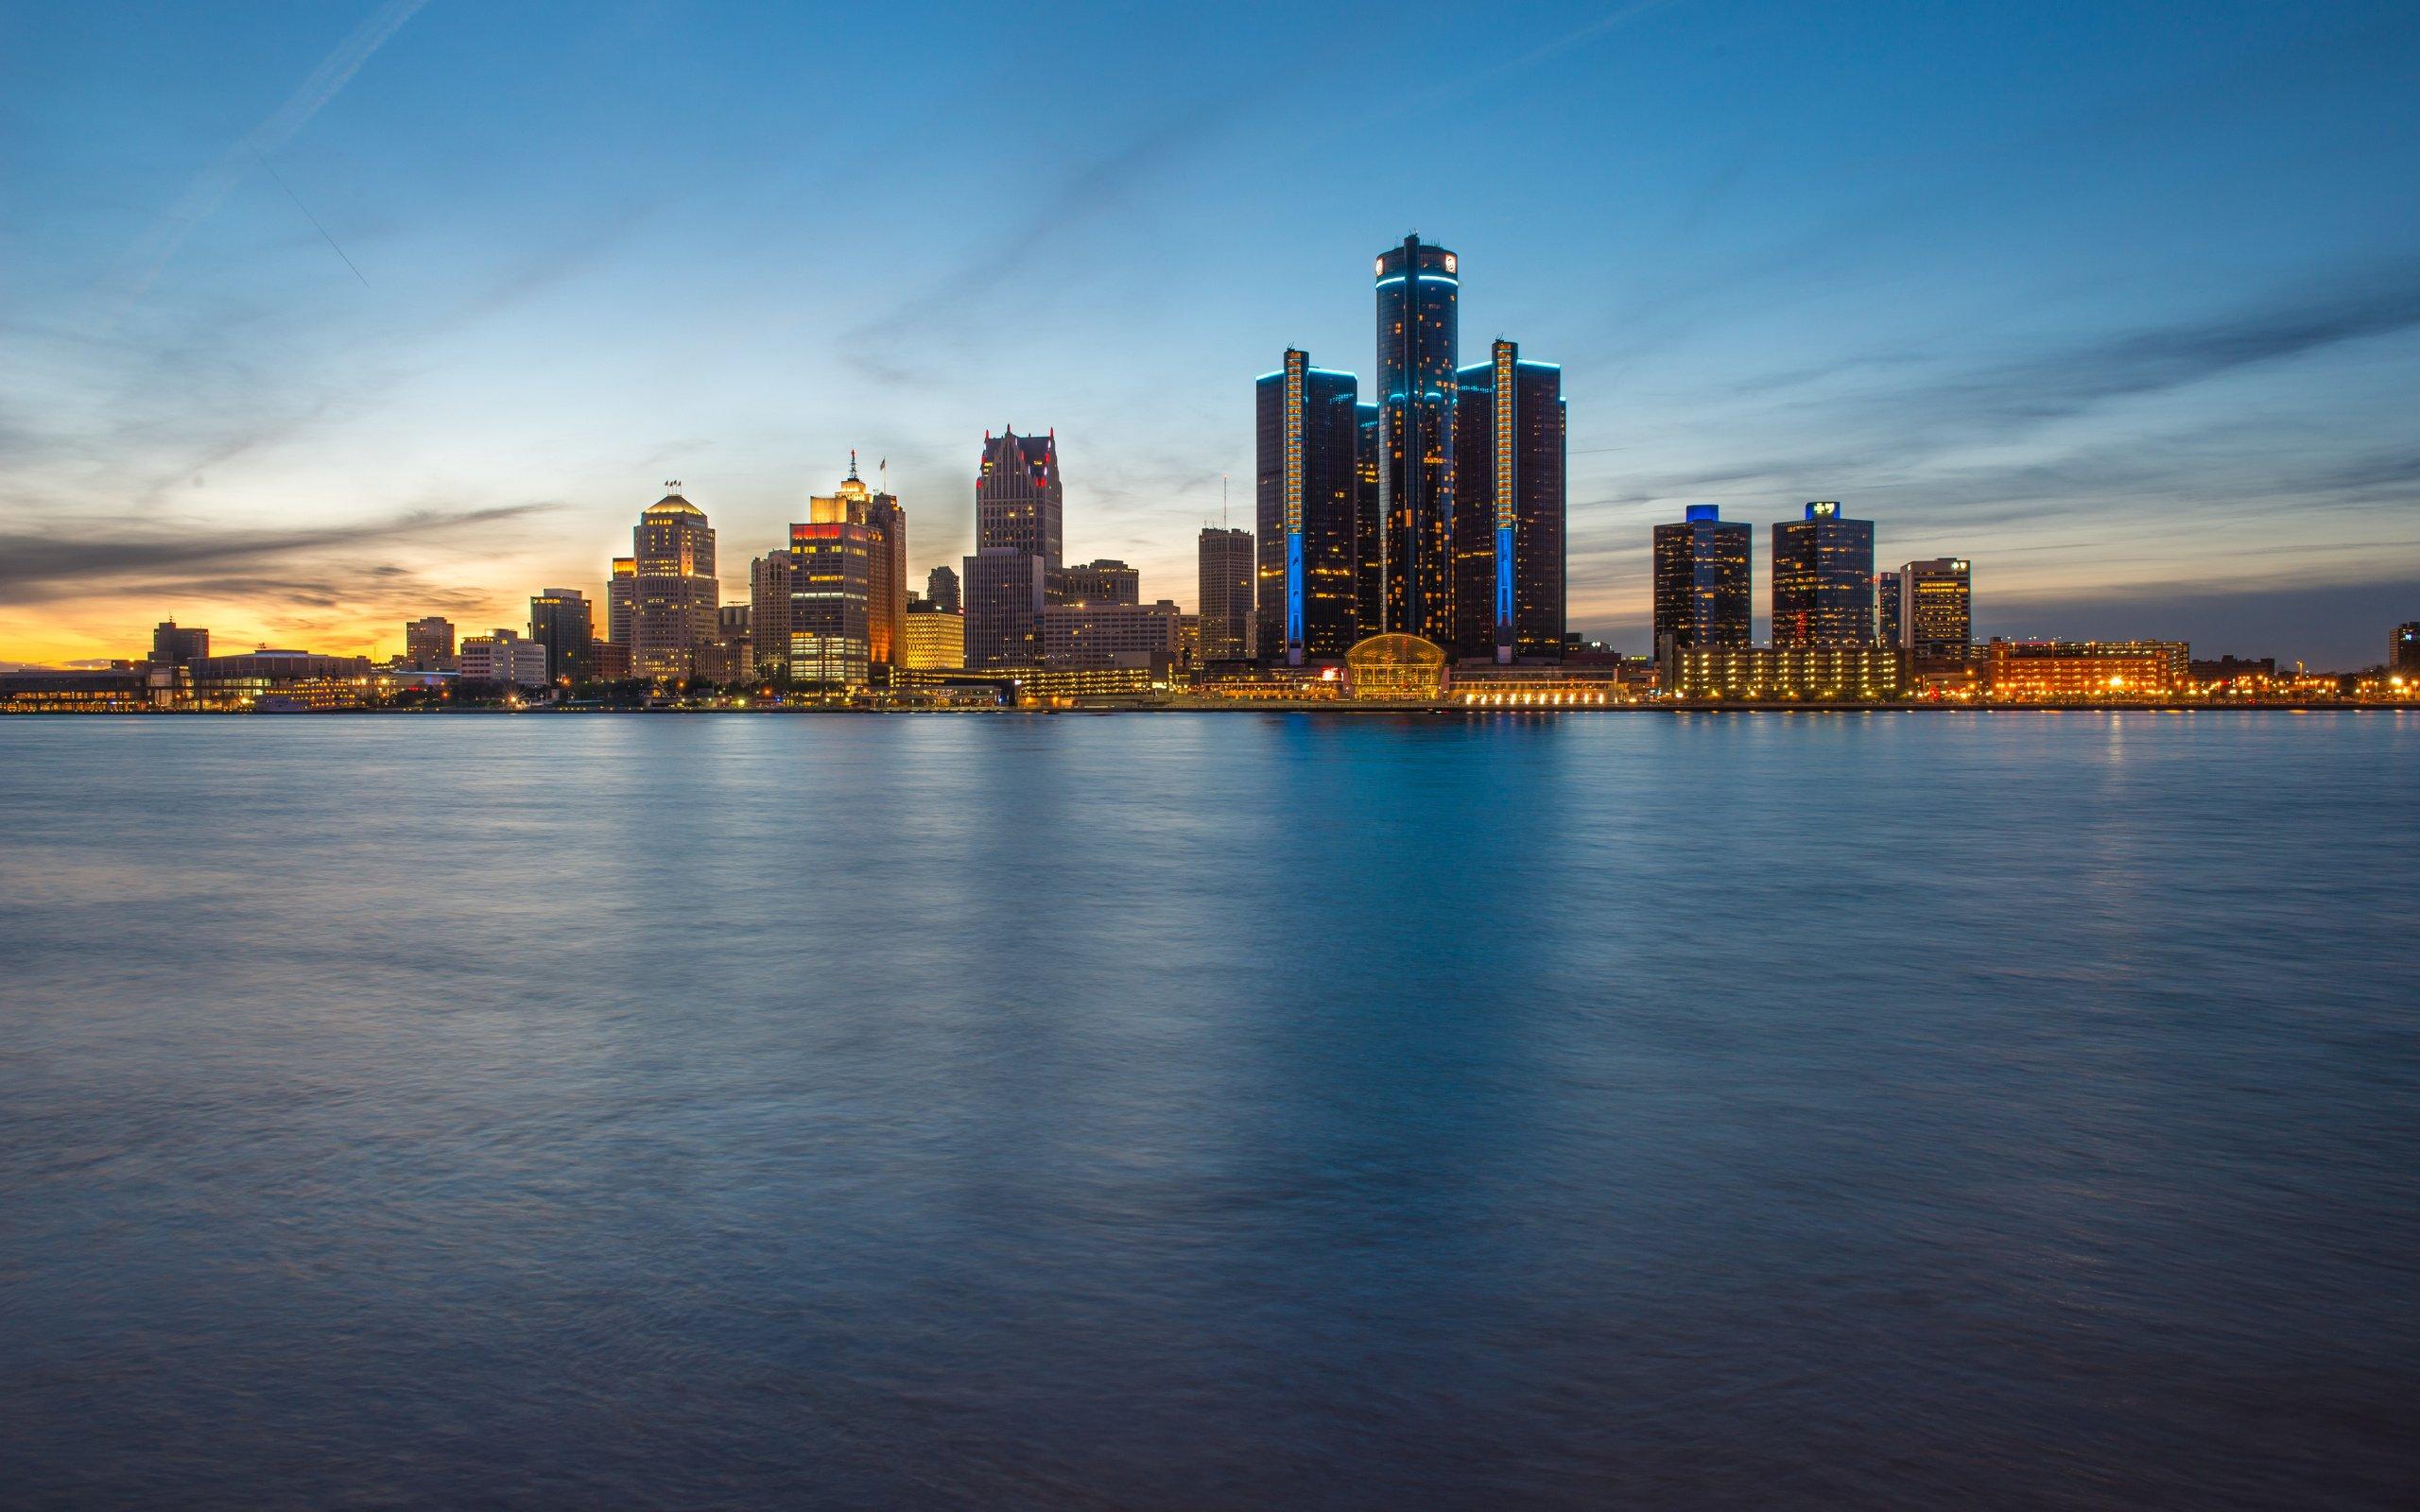 Best Free Wallpaper App For Iphone X Skyline Blue Hour Evening Detroit Wallpaper 2560x1600